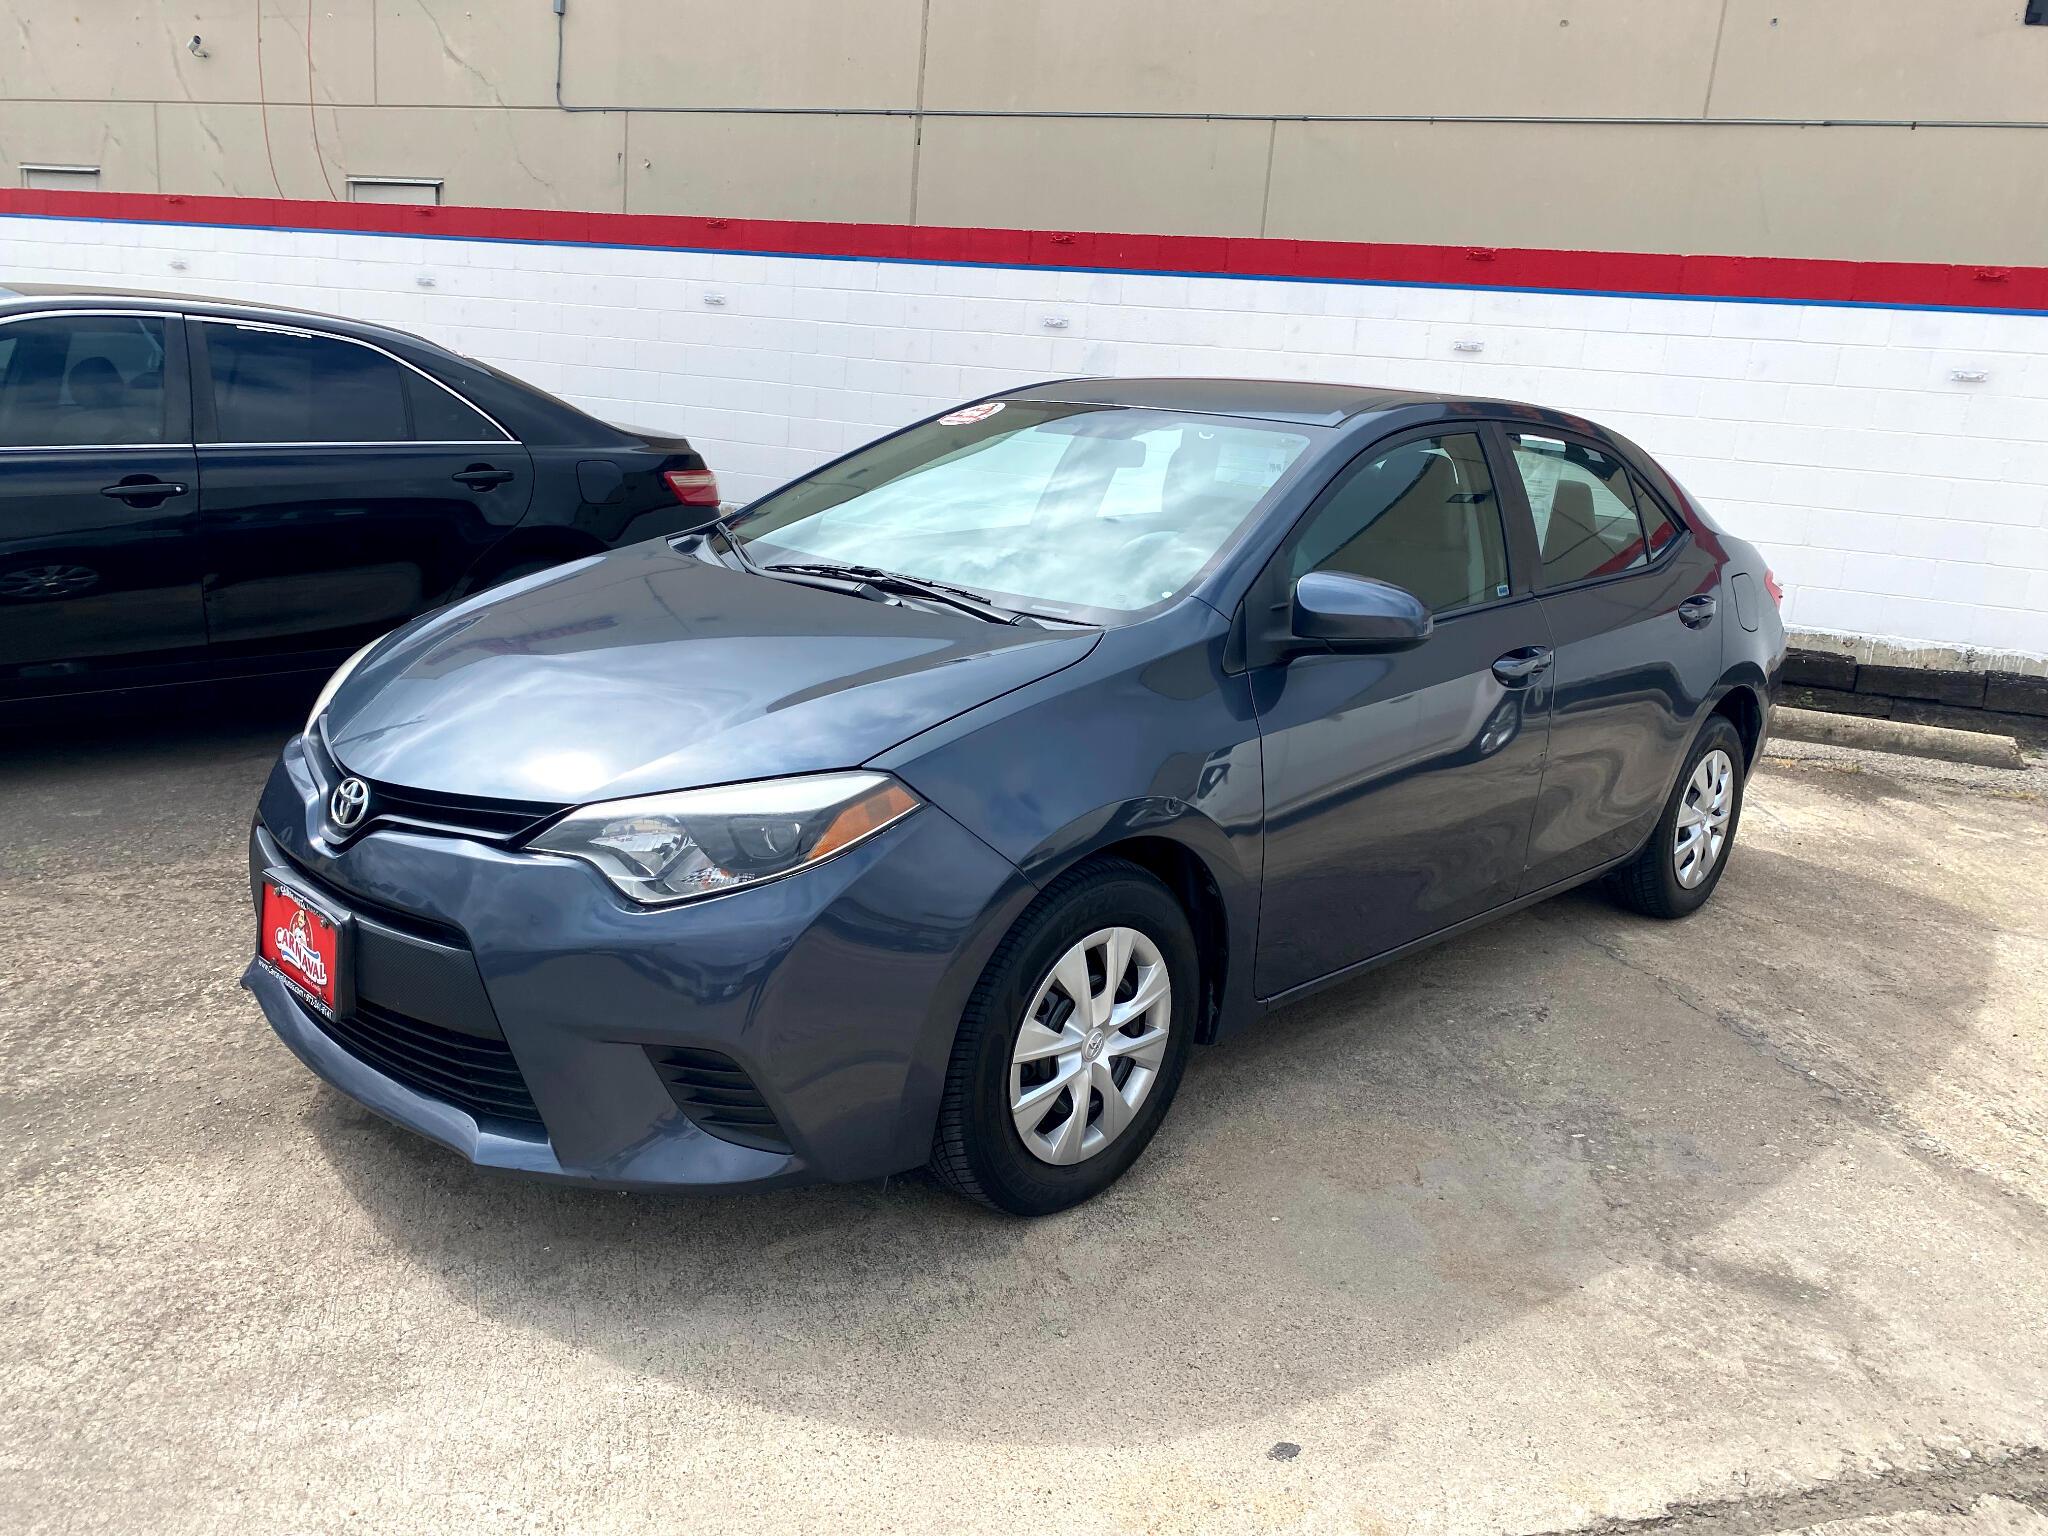 Toyota Corolla 4dr Sdn CVT LE Premium (Natl) 2015